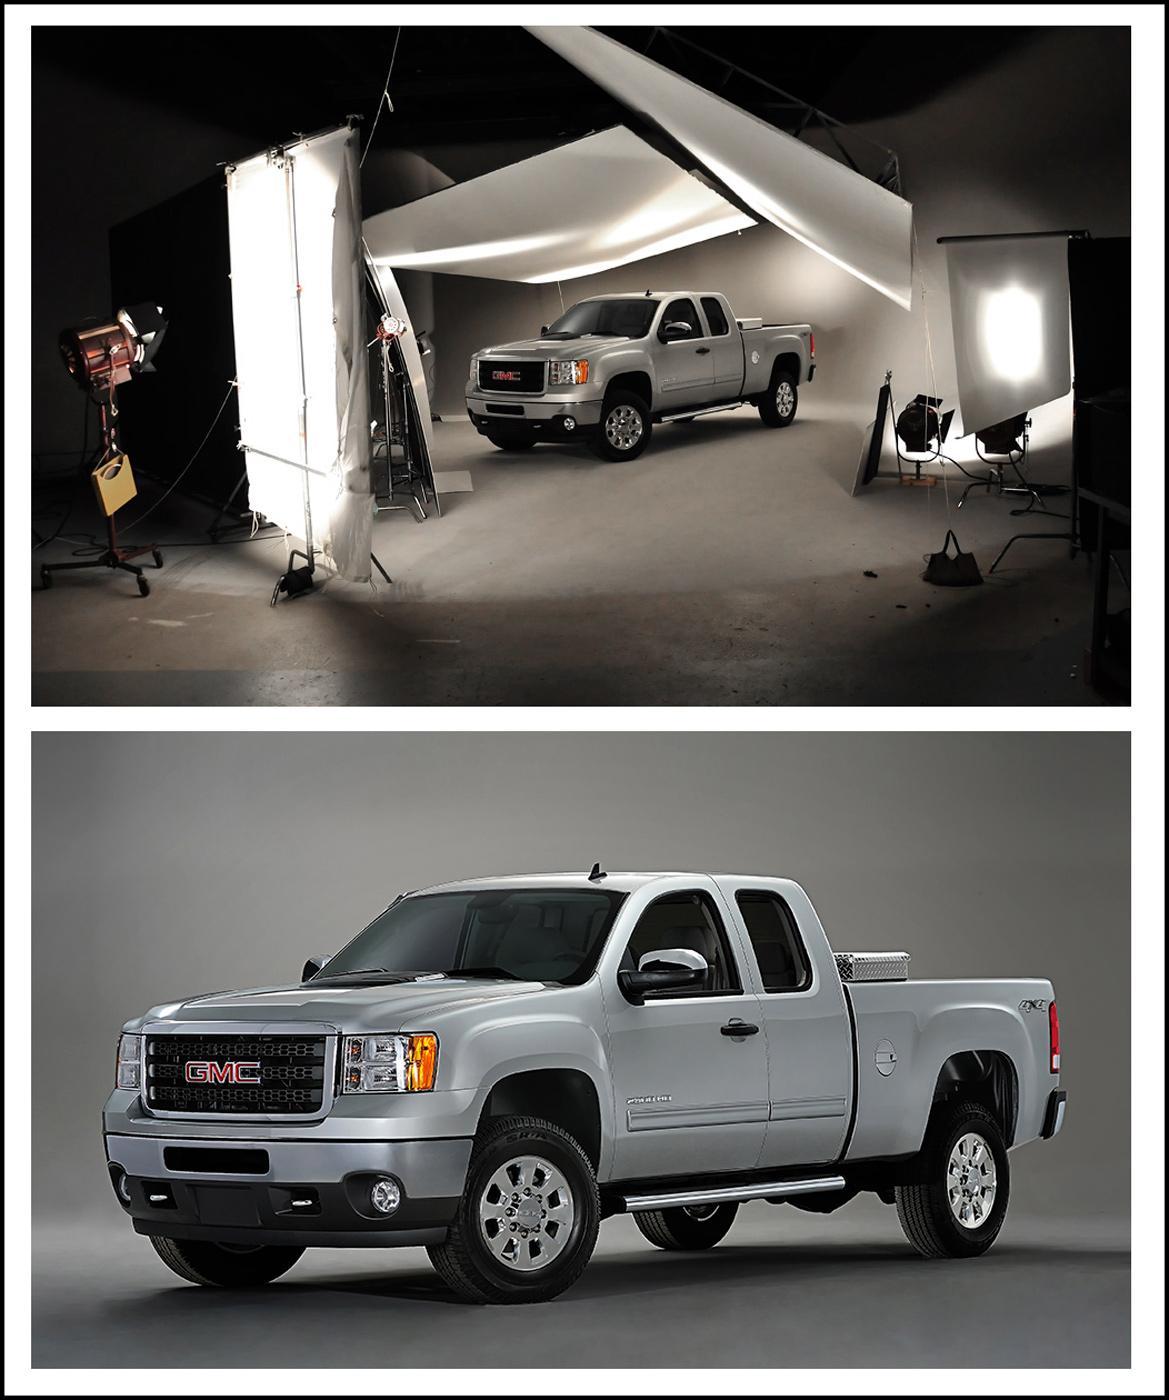 photography of GM trucks